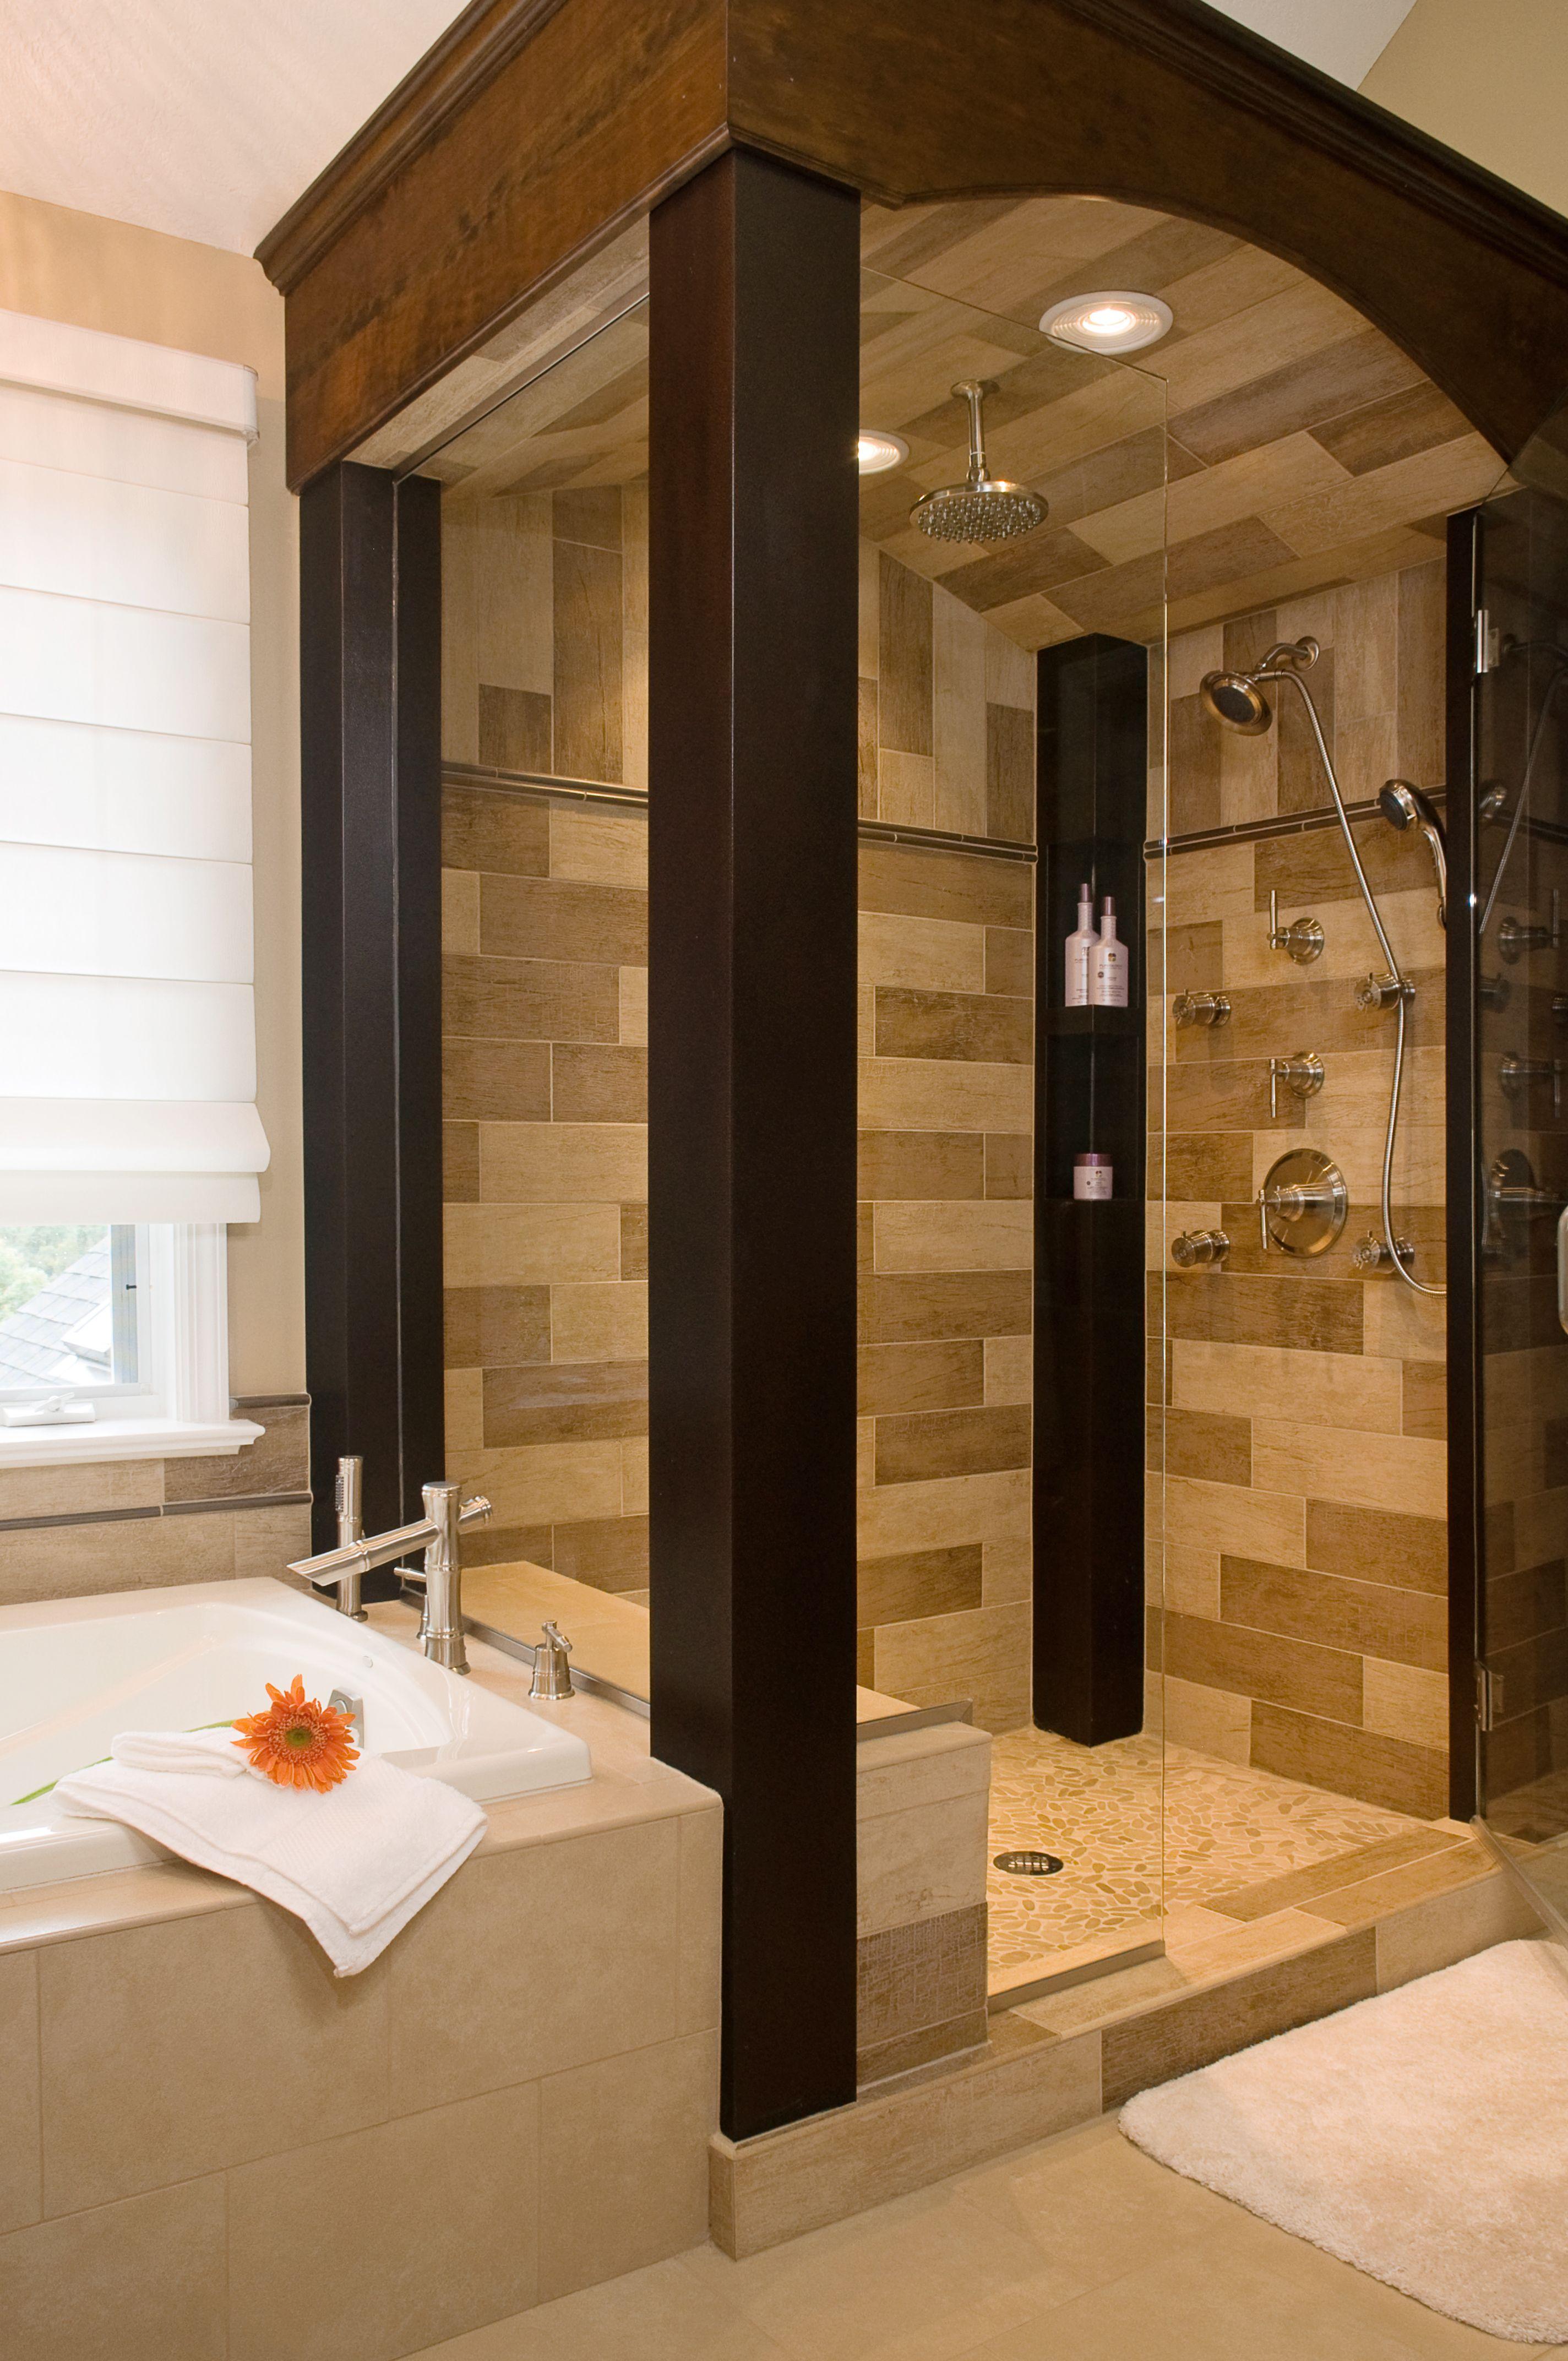 Beautiful custom design on a walk in shower metal columns beautiful custom design on a walk in shower metal columns ceramic tile interior dailygadgetfo Gallery